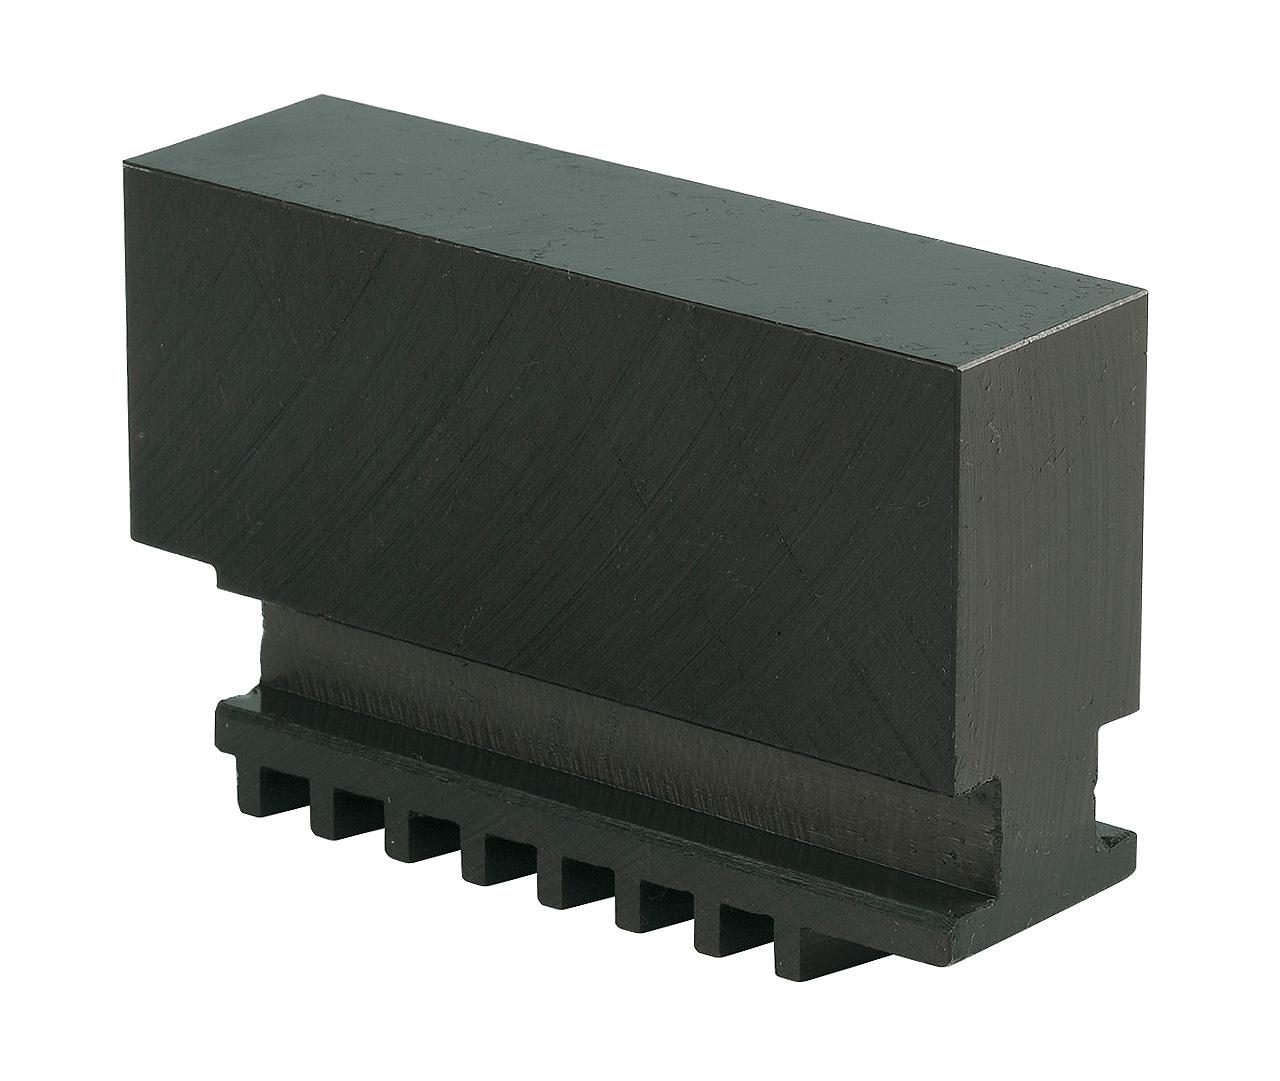 Szczęki jednolite miękkie - komplet SJ-PS4-250 BERNARDO